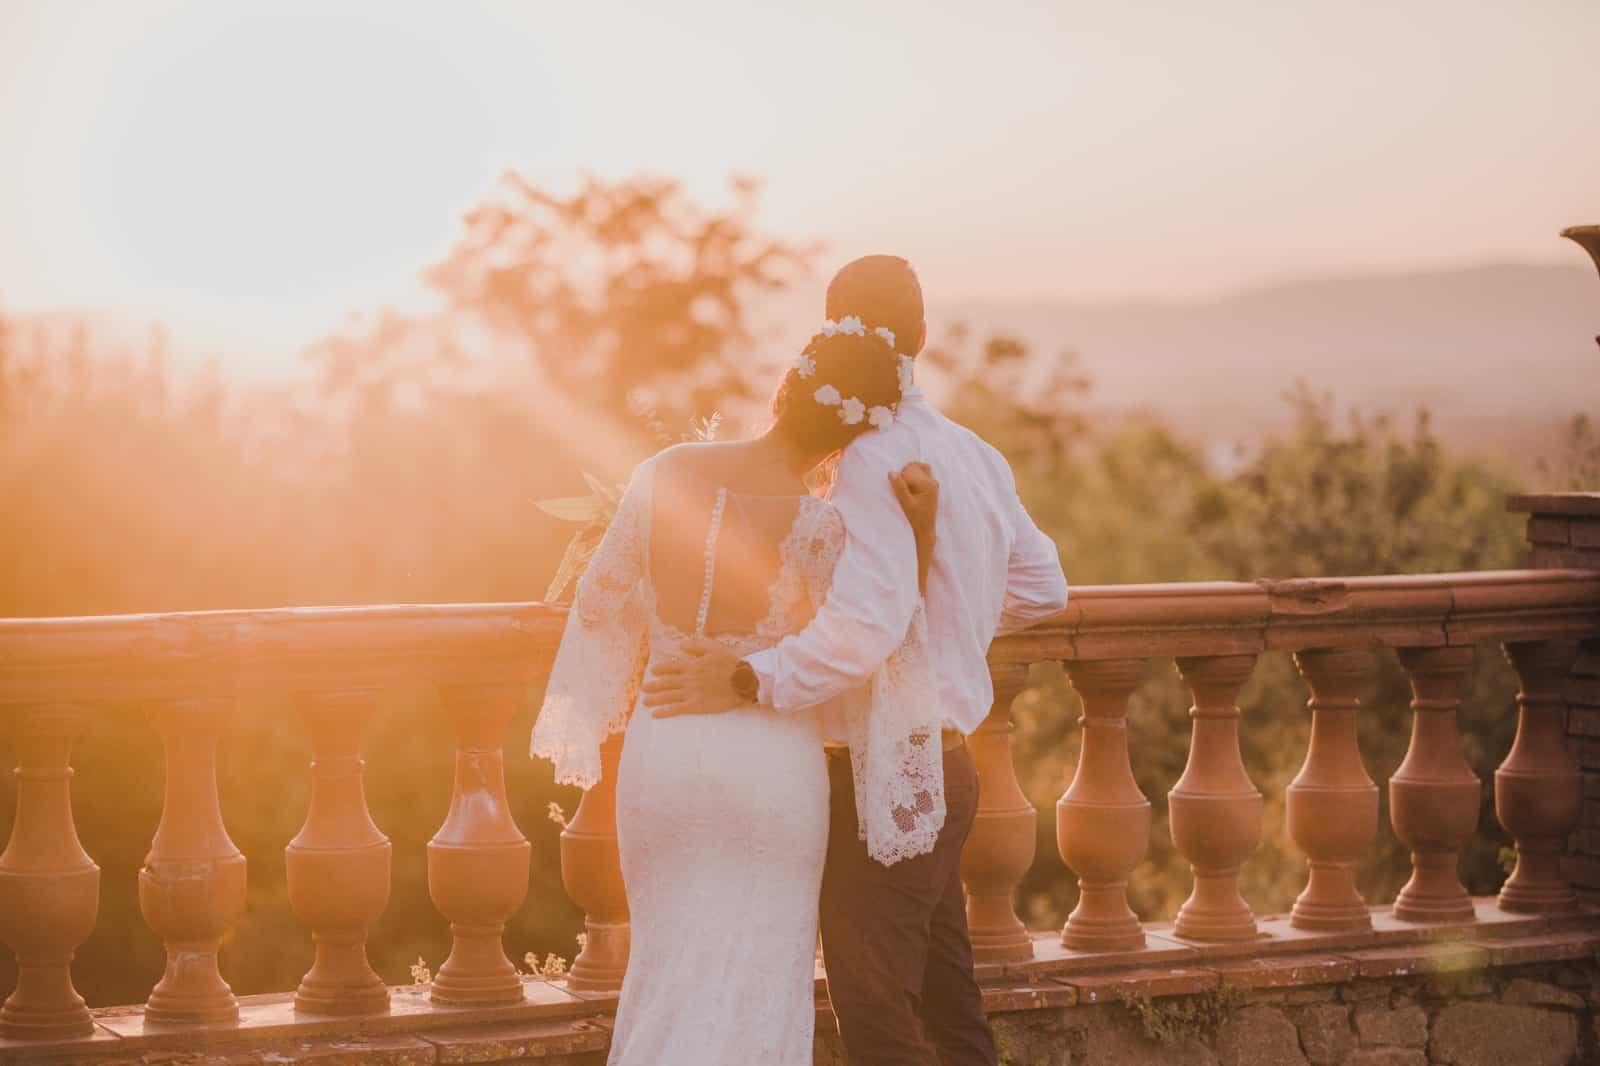 Imagina tu boda y hazla realidad